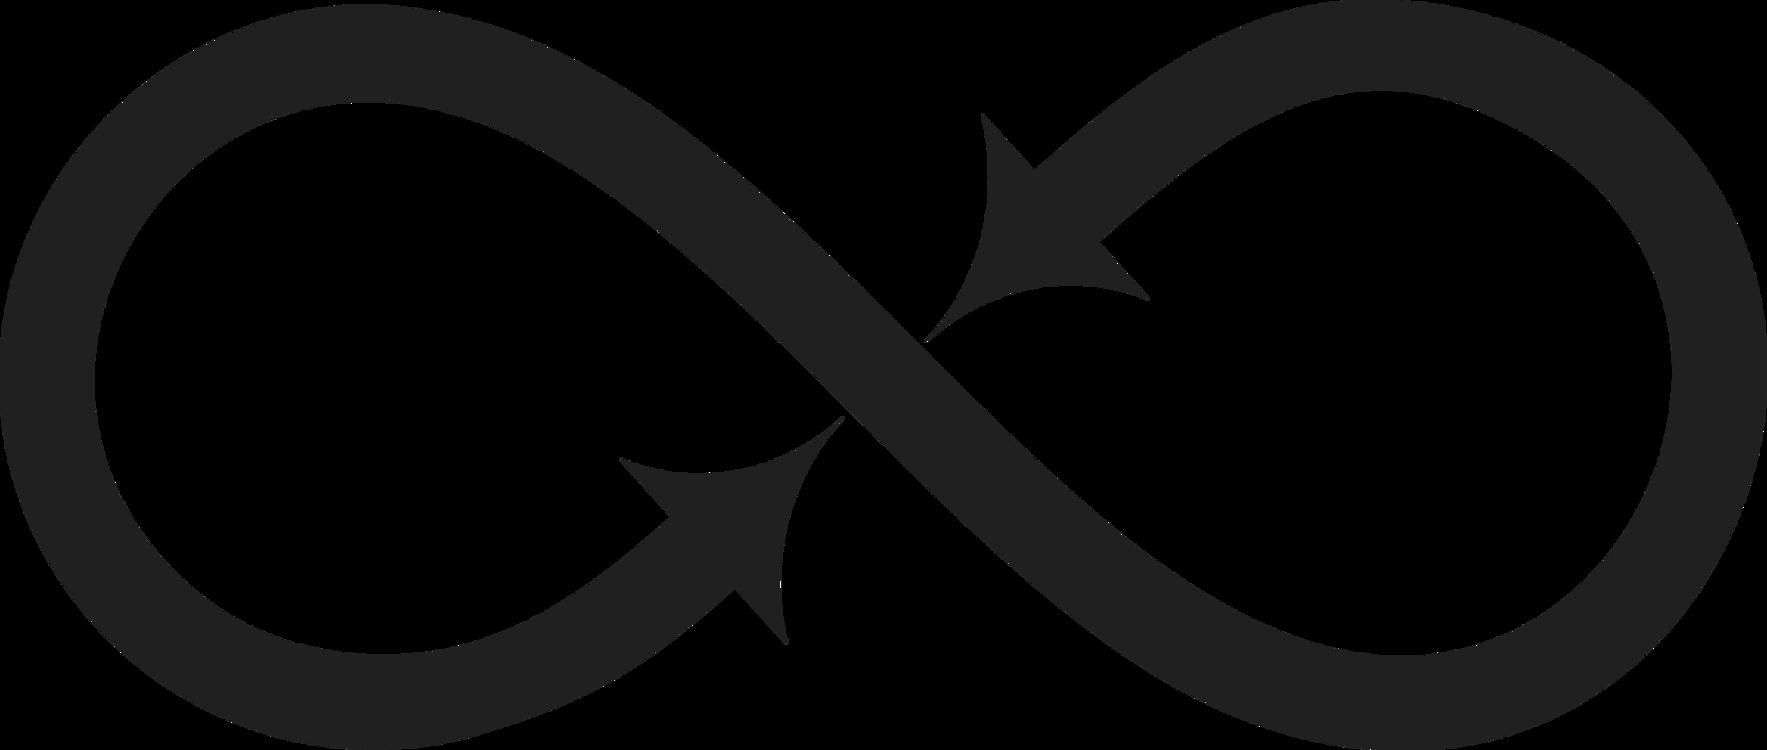 Monochrome Photography,Symbol,Logo PNG Clipart.